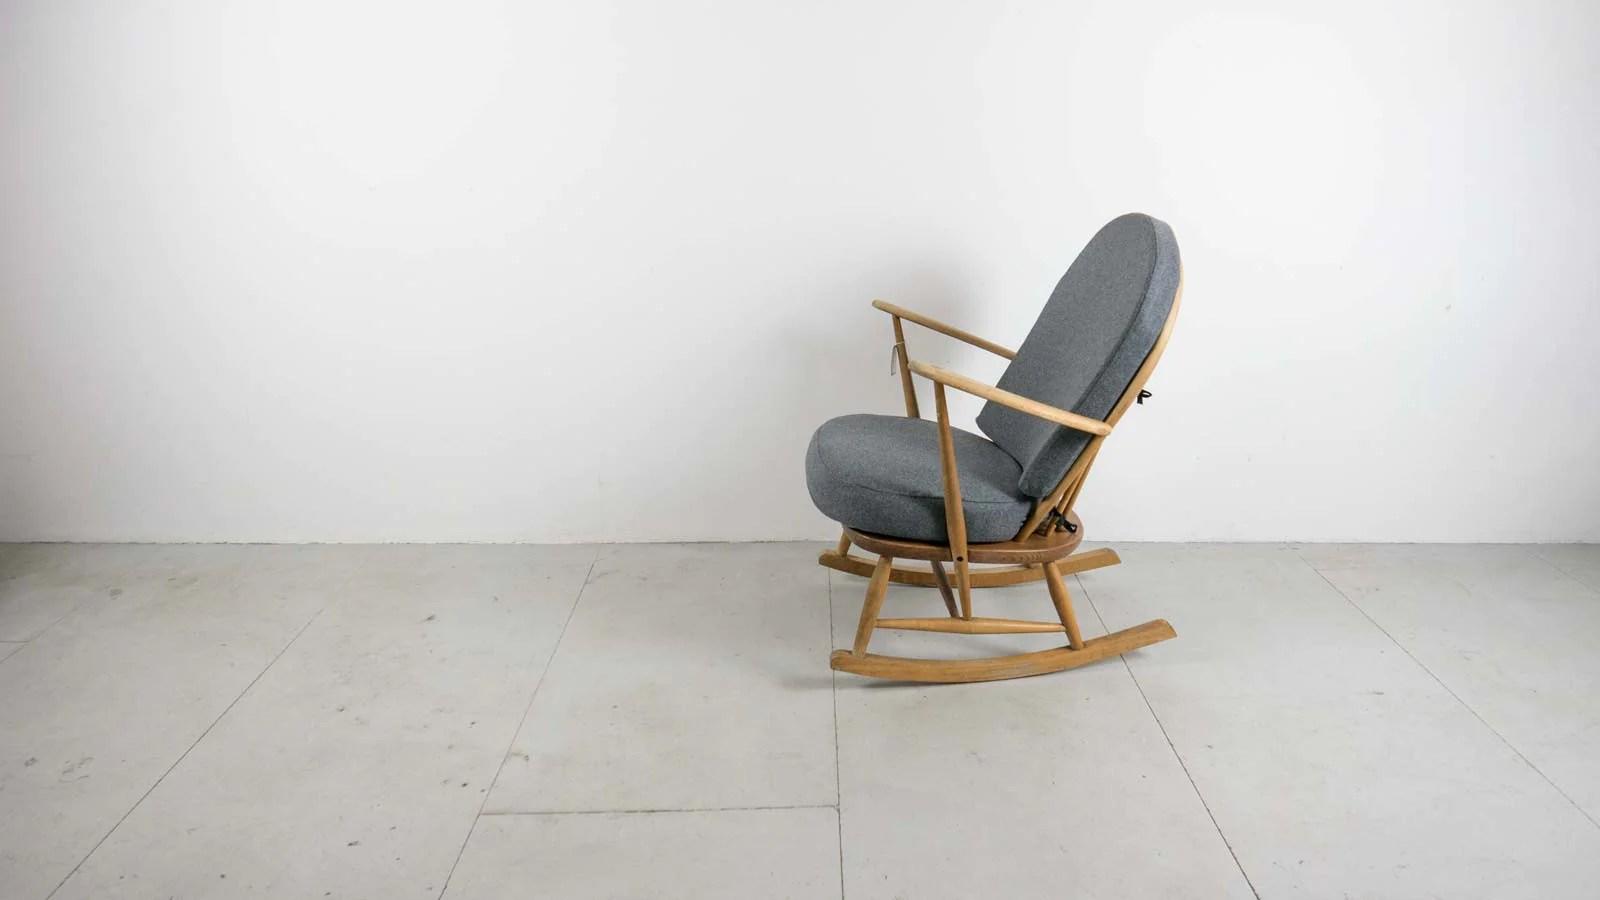 windsor rocking chair cushions zero gravity lounge cup holder ebtd vintage mid century ercol